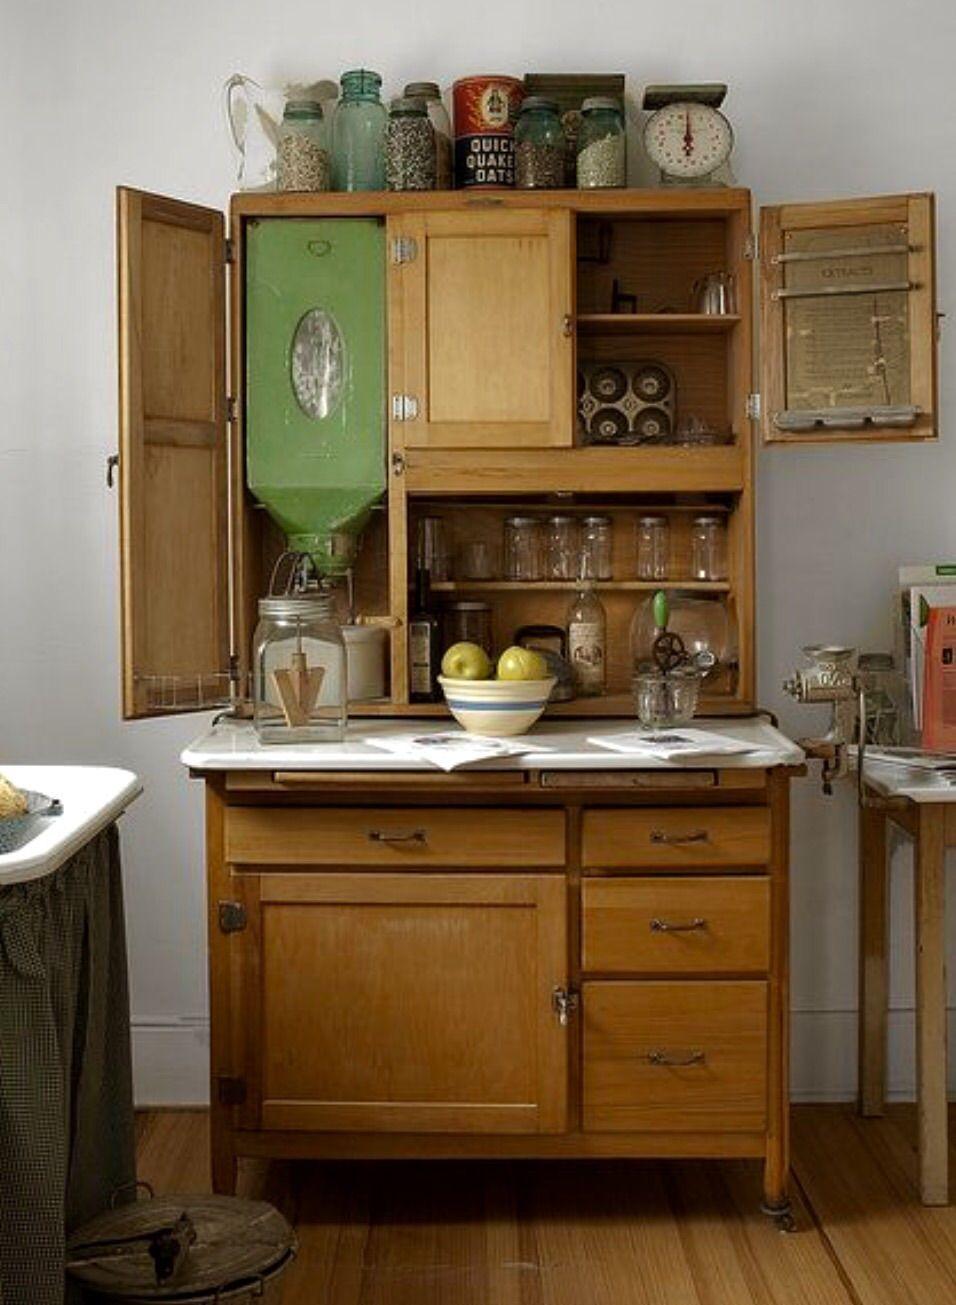 Antique Hutch With Flour Dispenser Vintage Household